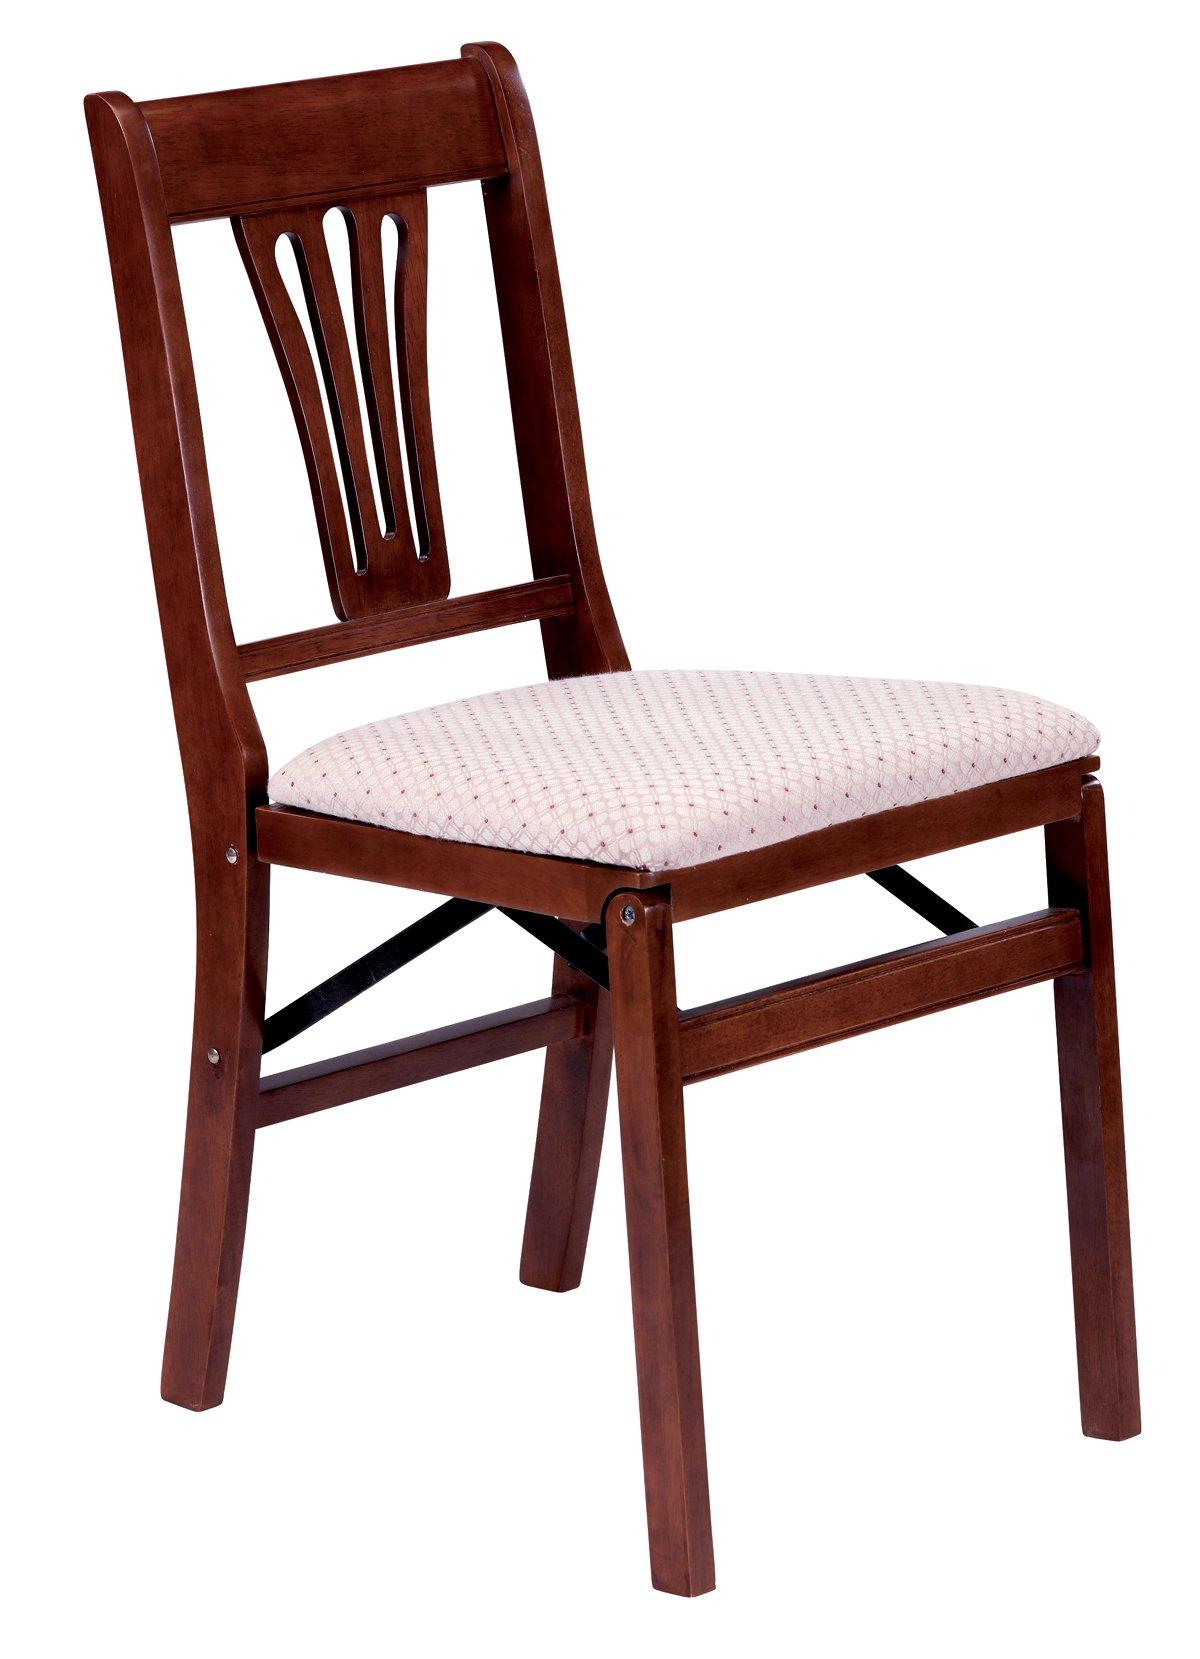 Stakmore Urn Back Folding Chair Finish, Set of 2, Cherry